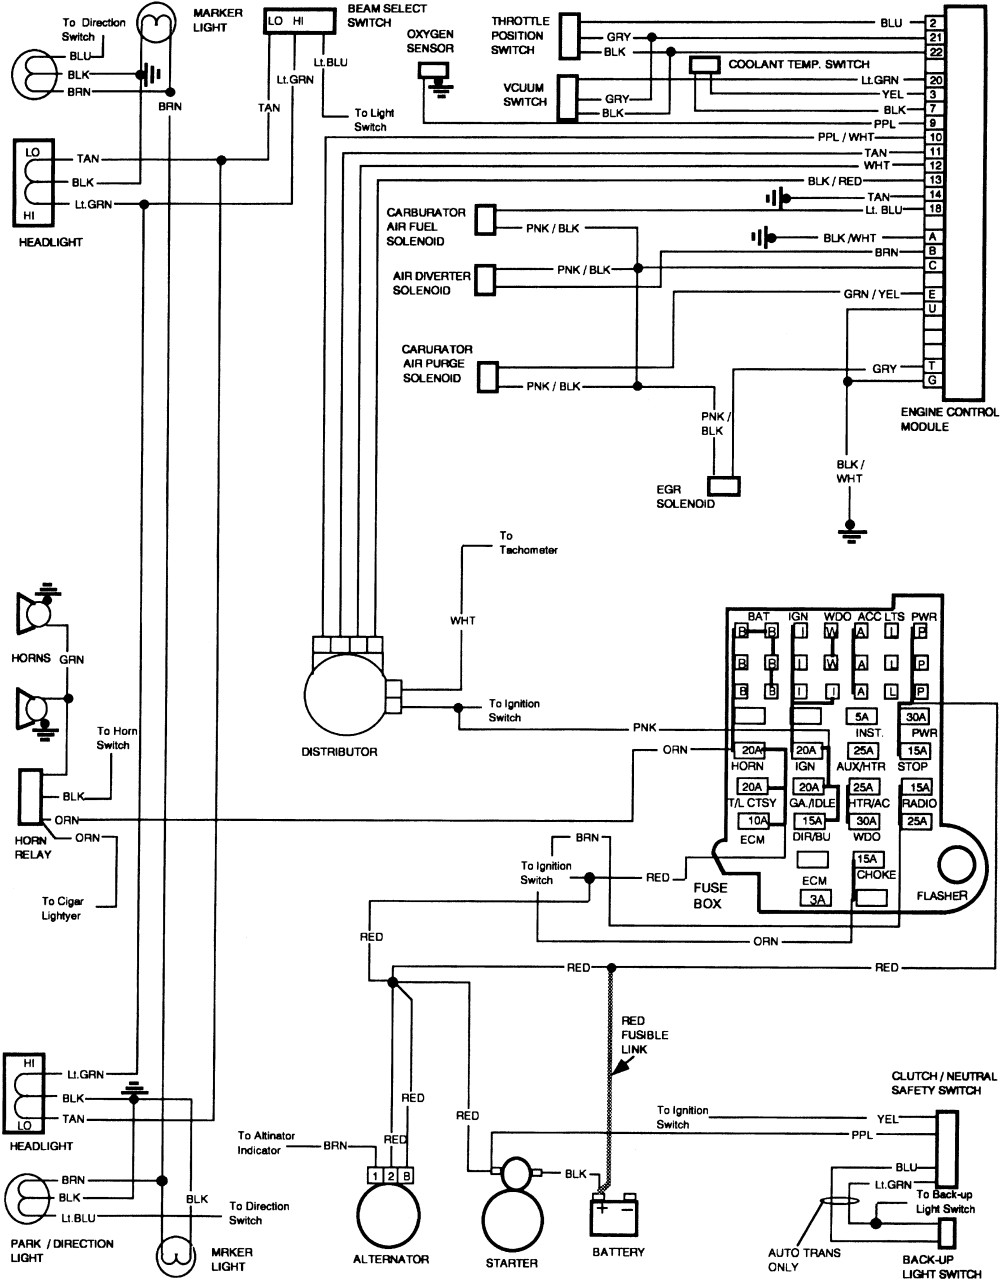 1983 Chevy Alternator Wiring 03 Gmc Truck Wiring Harness Diagram Maclareners Tegang Madfish It